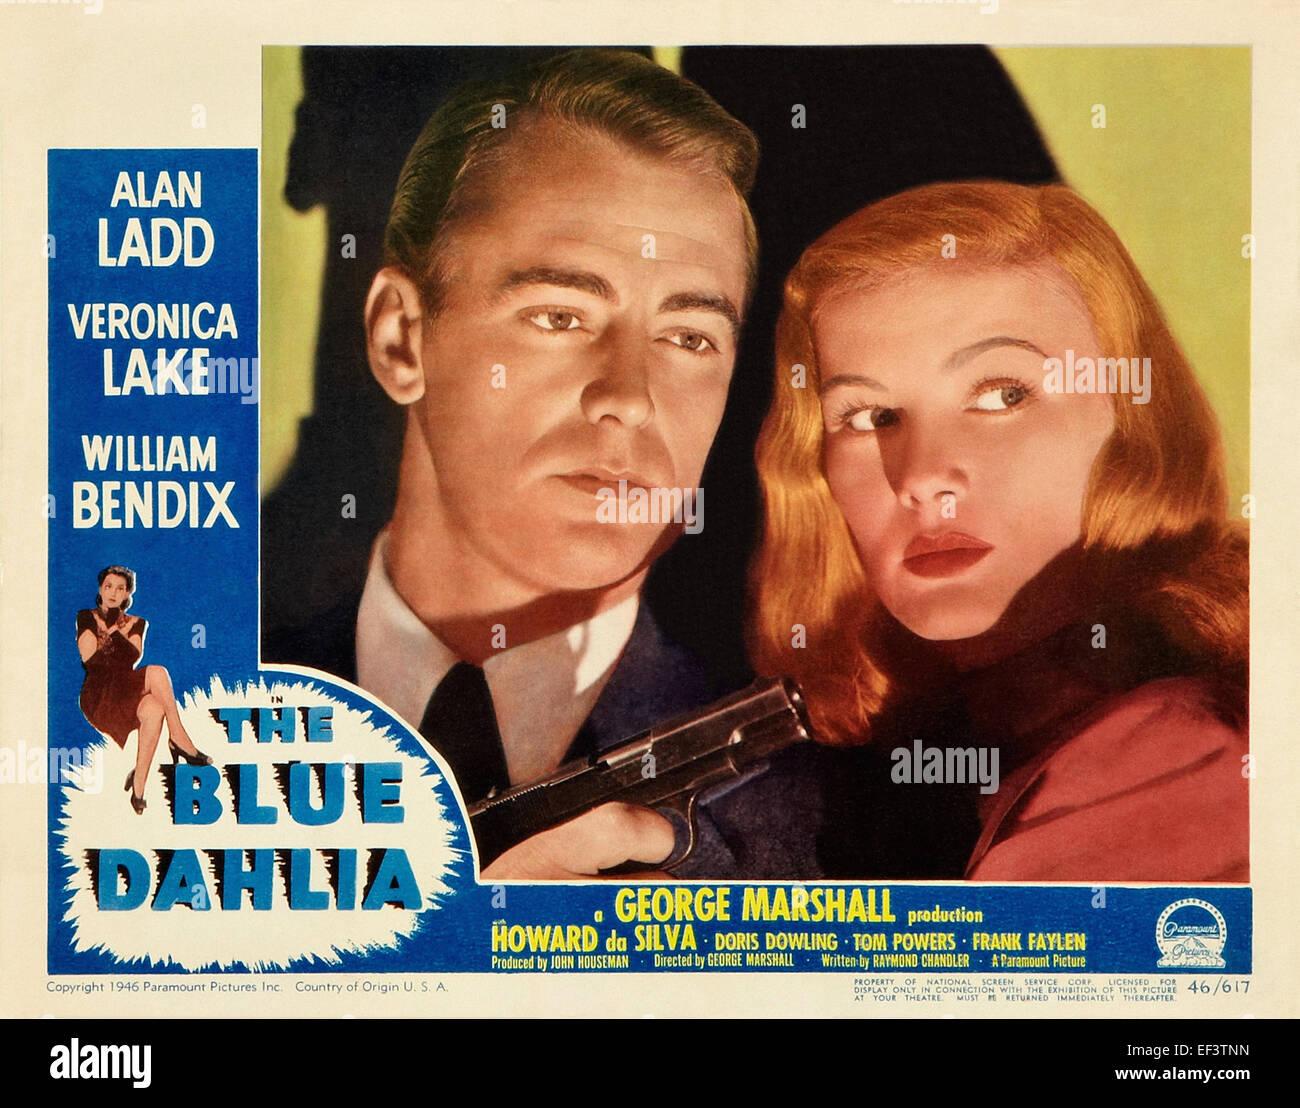 The Blue Dahlia - Veronica Lake, Alan Ladd - Movie Poster - Stock Image